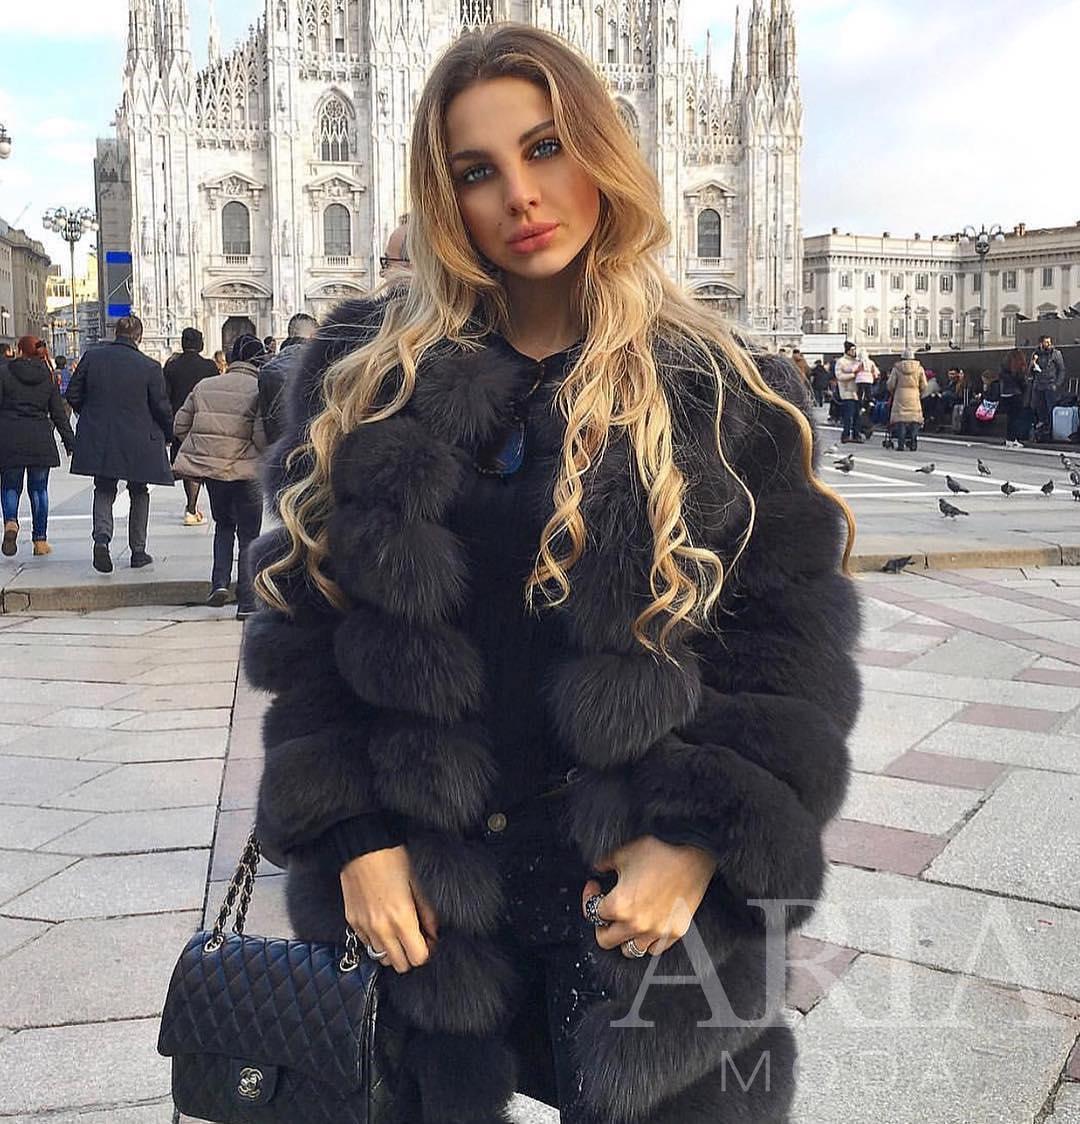 Fur Coat For Autumn In Milan 2019